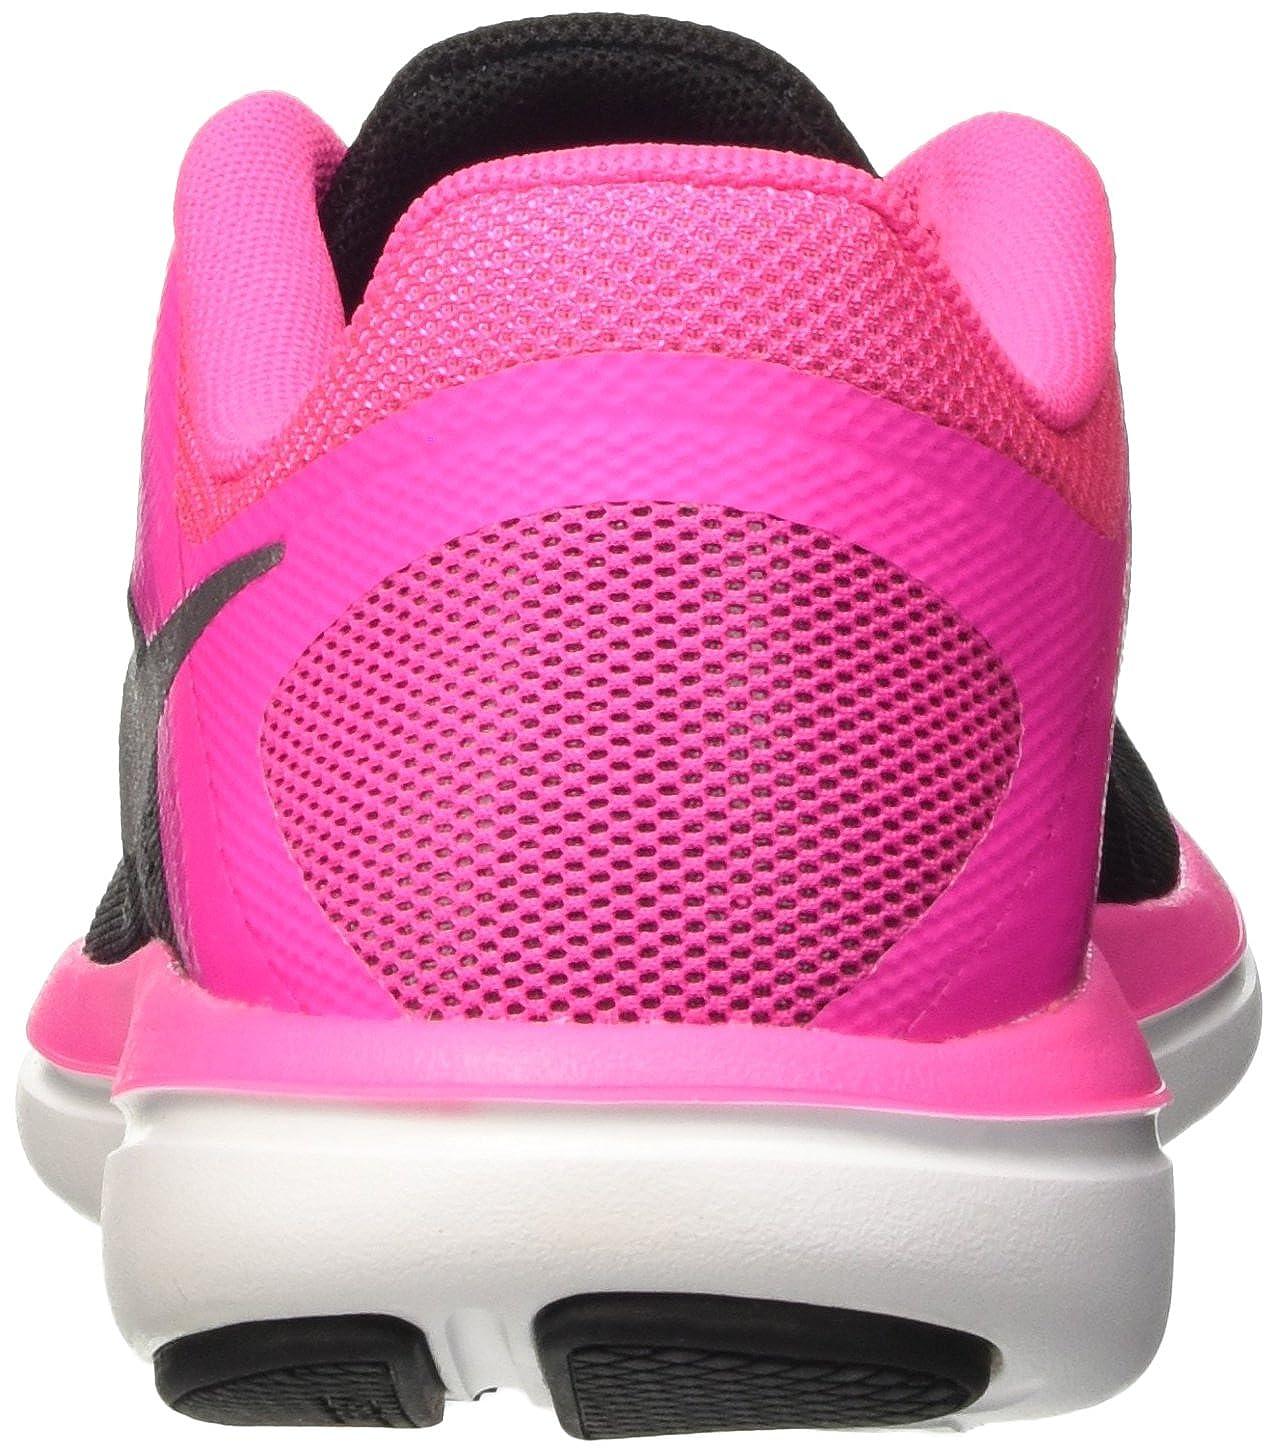 Men's/Women's Nike Lady In-Season TR TR TR Fitness Cross-Training Shoes wholesale special promotion Fashion dynamic WR13964 208b63